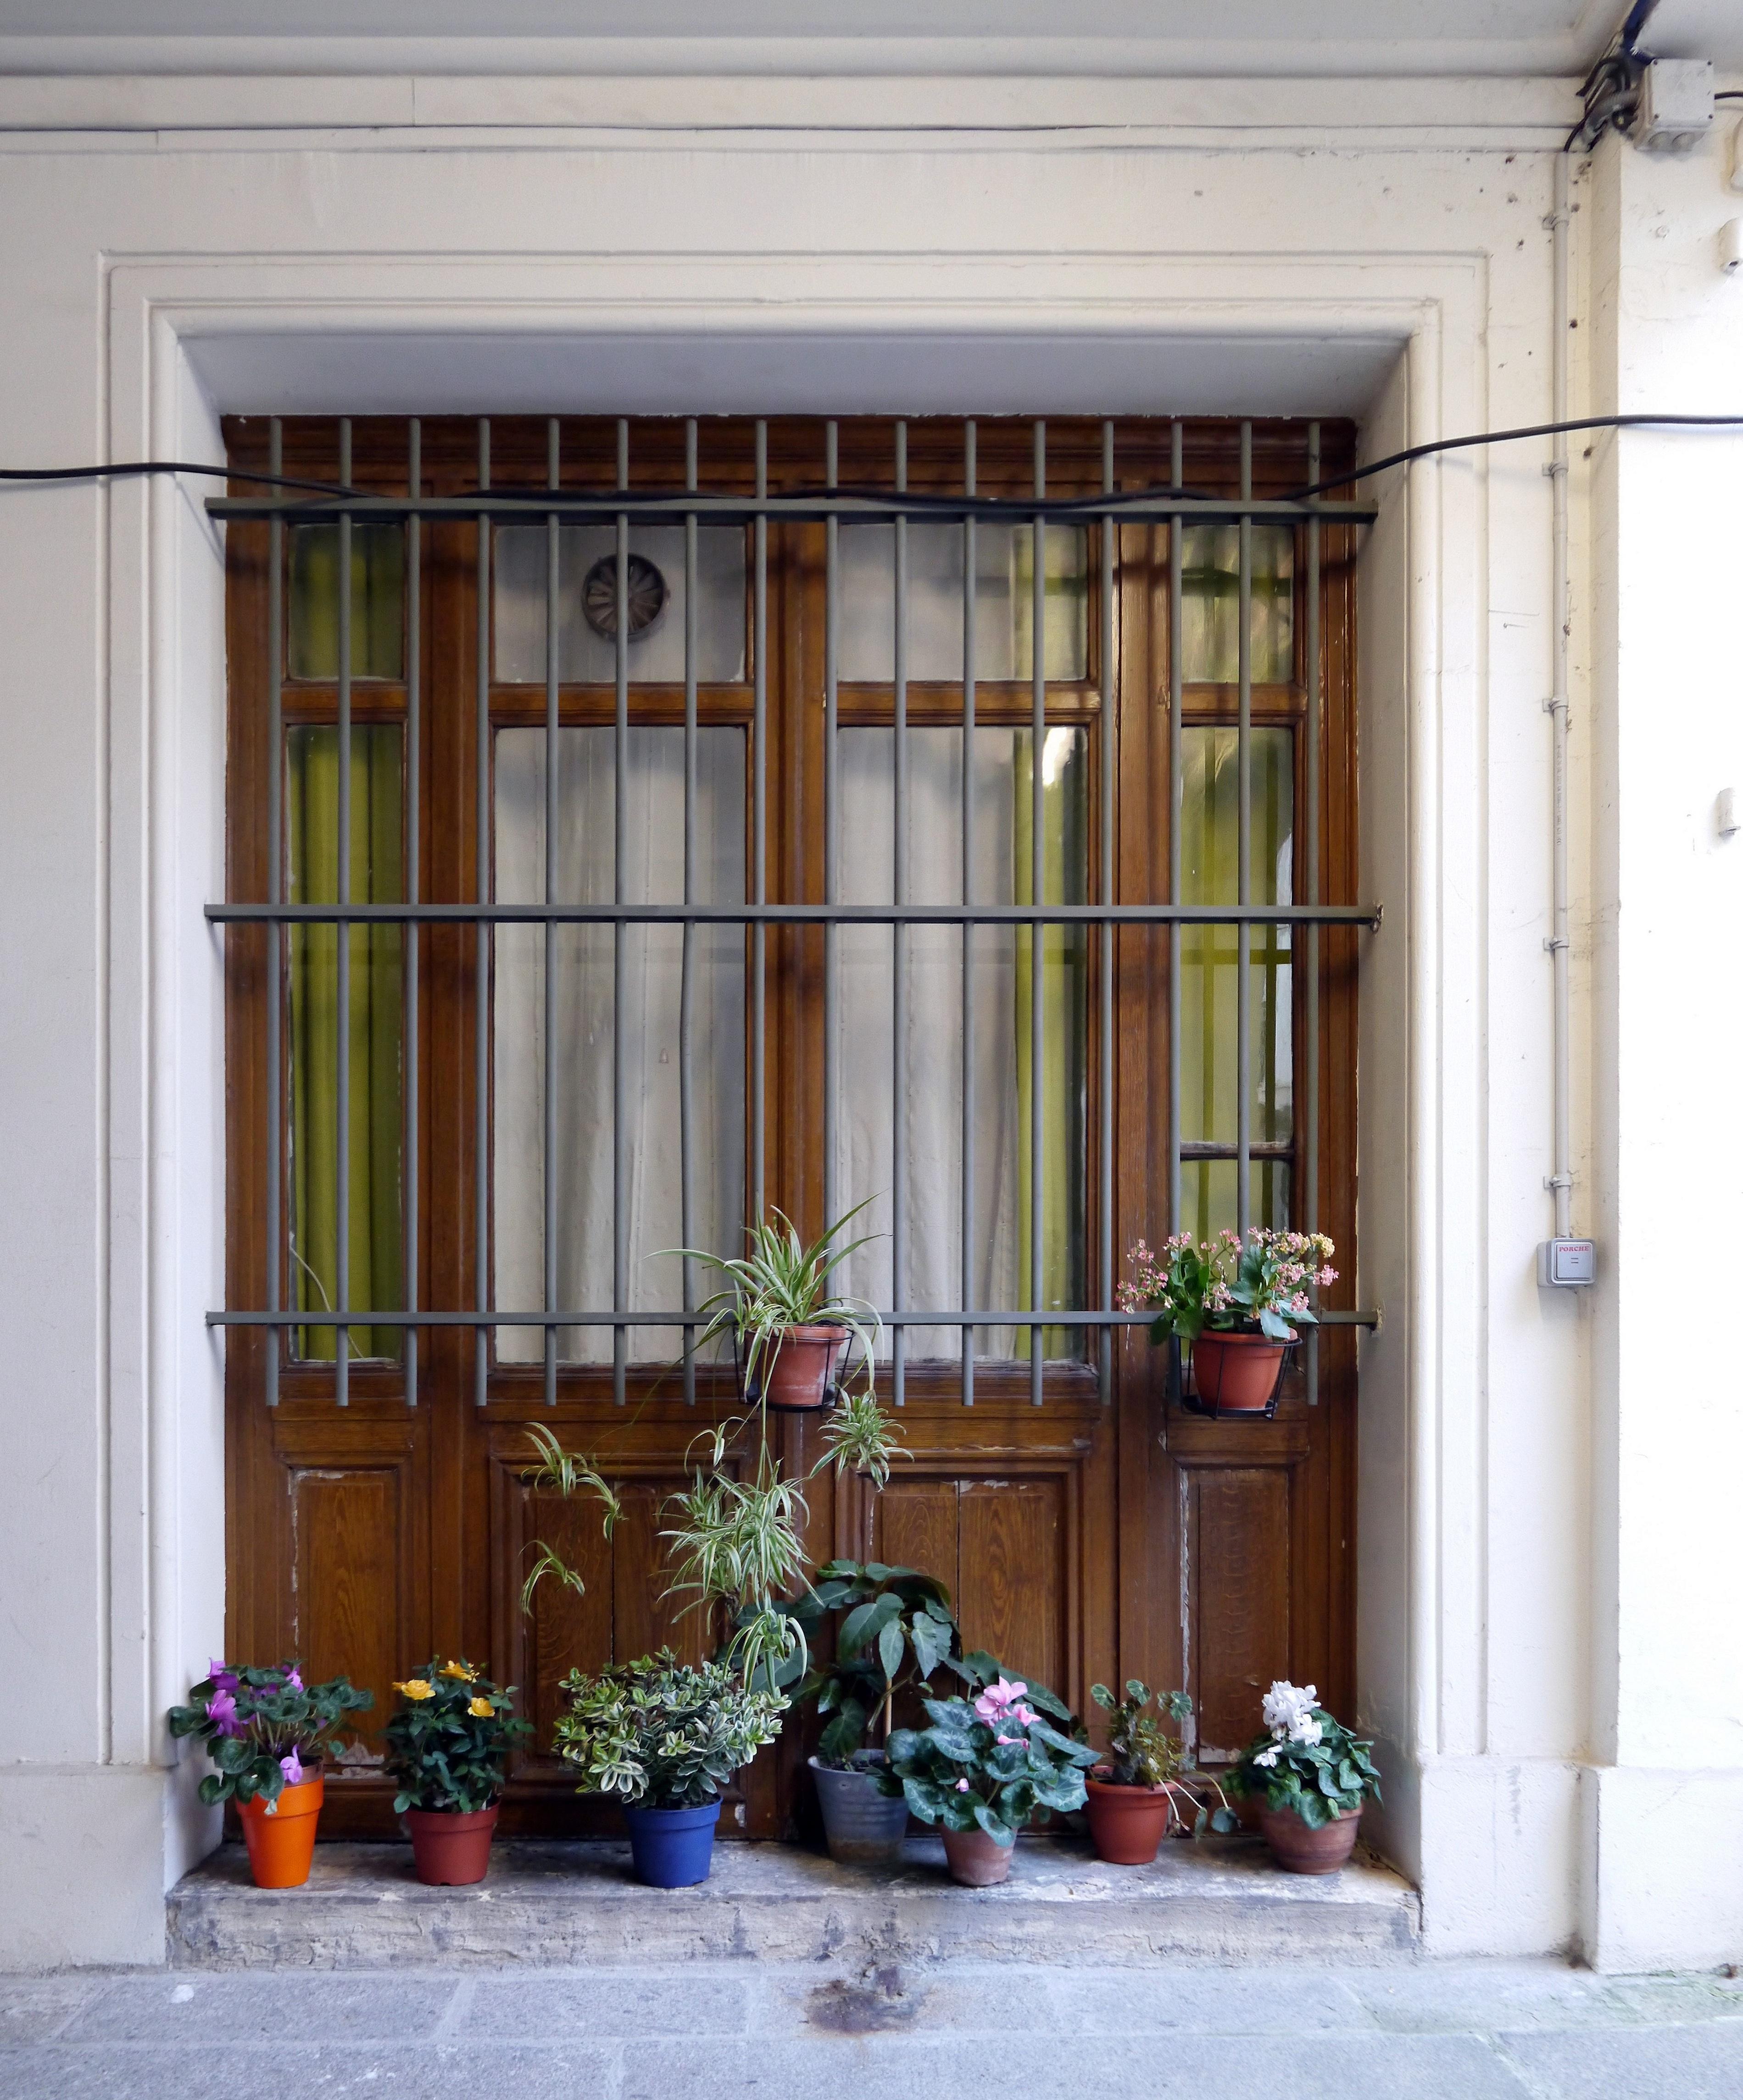 file window rue de rochechouart paris wikimedia commons. Black Bedroom Furniture Sets. Home Design Ideas